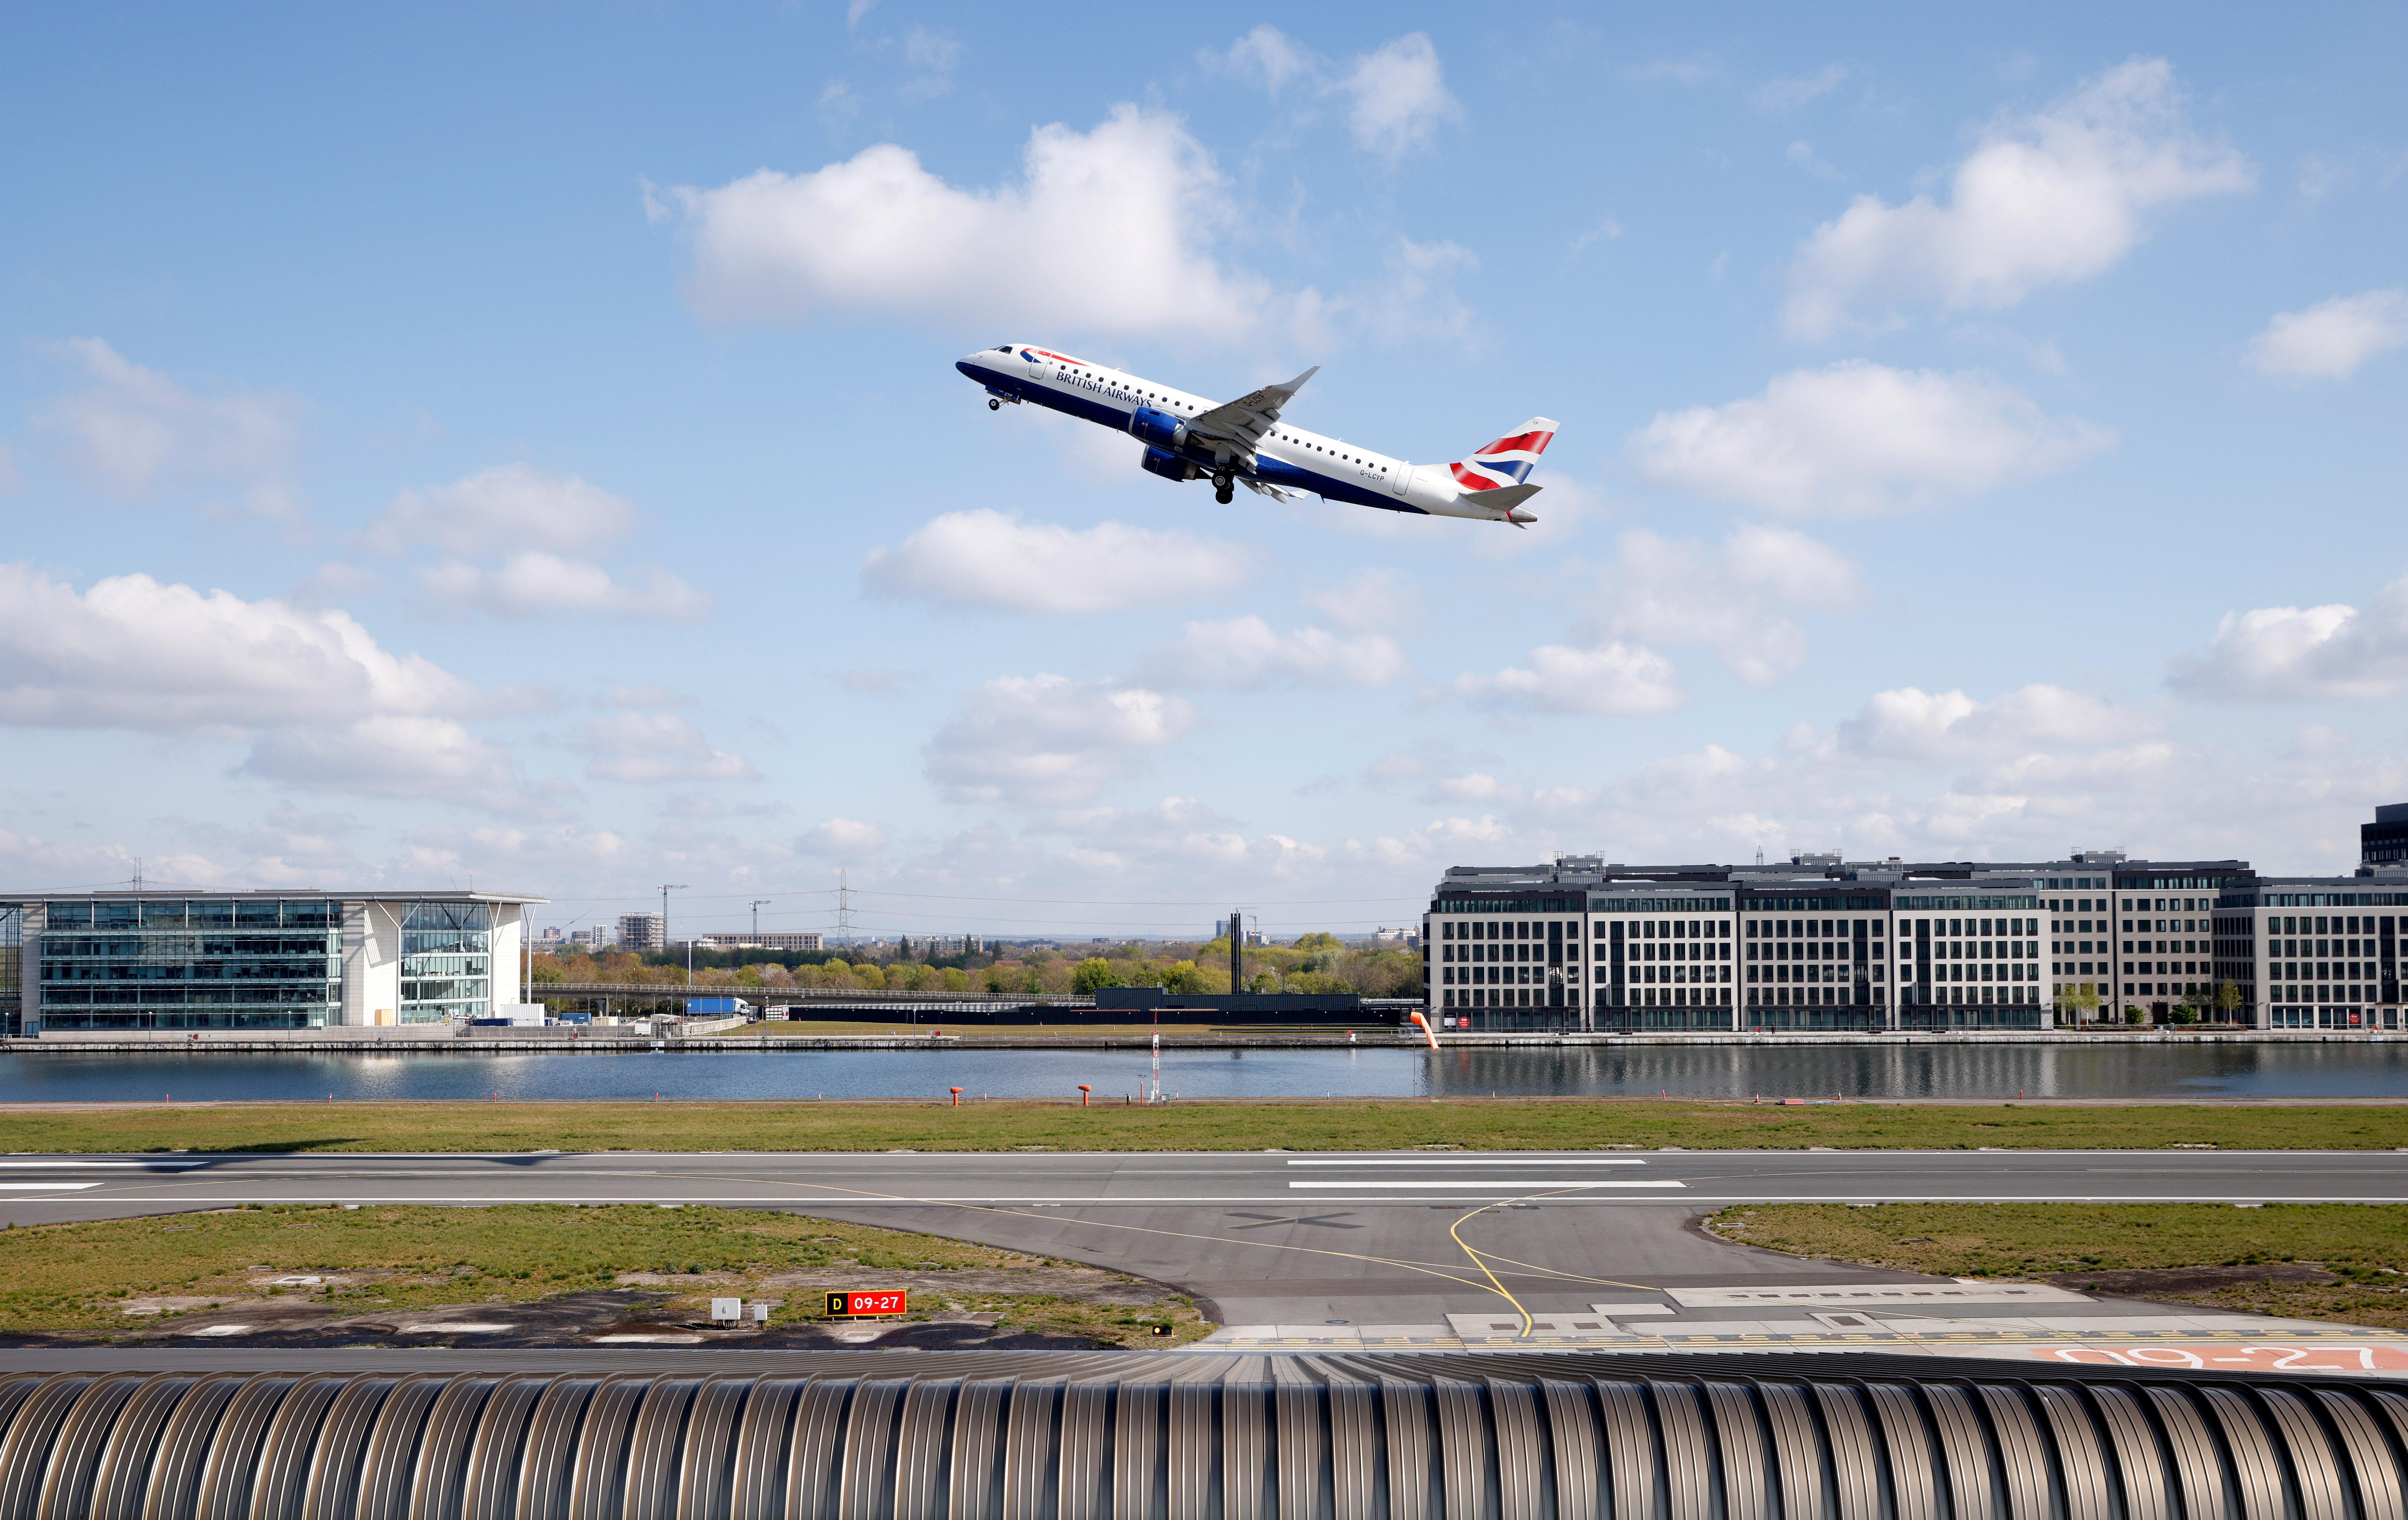 British Airways Embraer 190 aircraft takes off from London City Airport, Britain, April 29, 2021. REUTERS/John Sibley